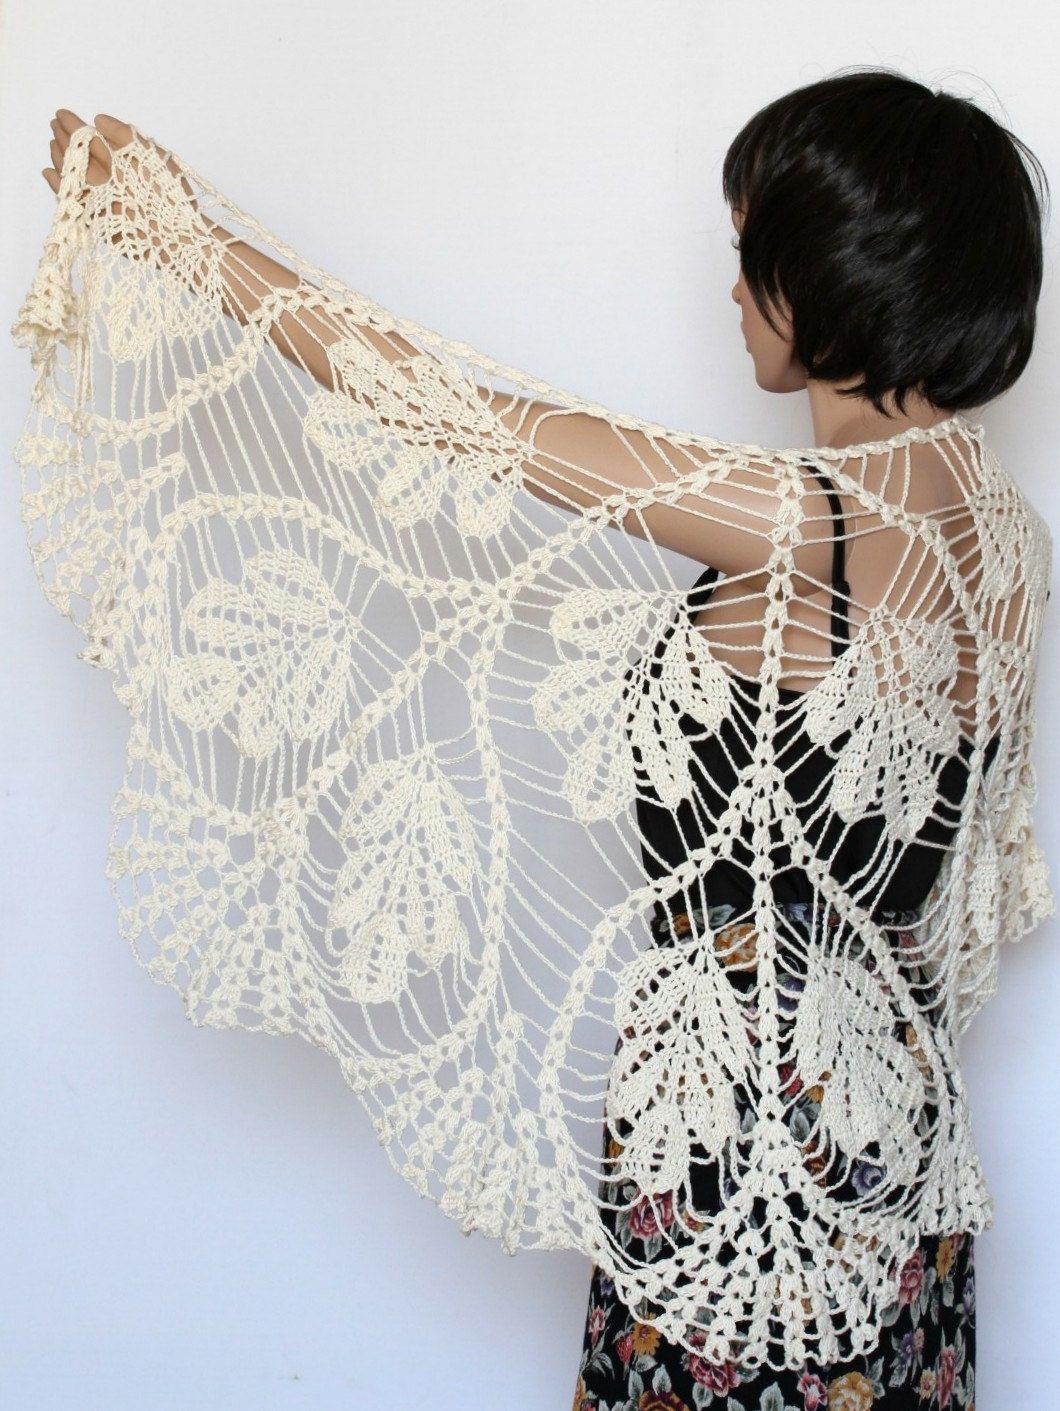 Ivory off white shawl lace knit shawl wedding shawl wraps shawls ivory off white shawl lace knit shawl wedding shawl wraps shawls 10900 usd by crochet shawl patternsscarf bankloansurffo Image collections